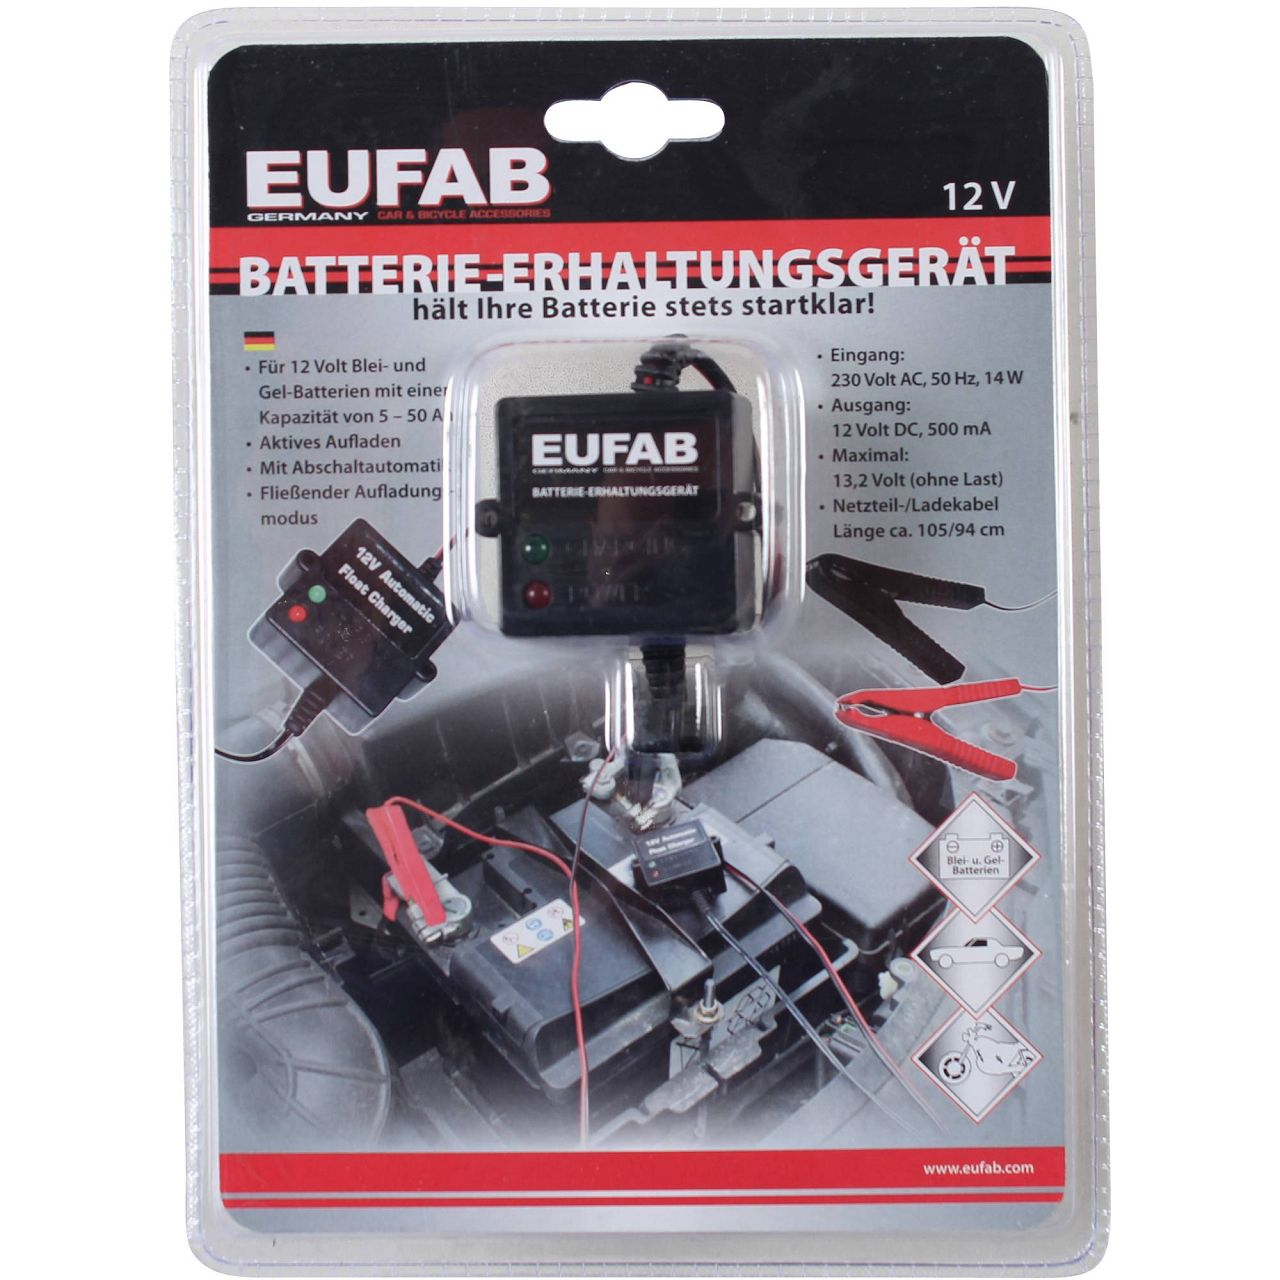 EUFAB 16505 Batterie-Erhaltungsgerät Automatikladegerät 12V 500mA